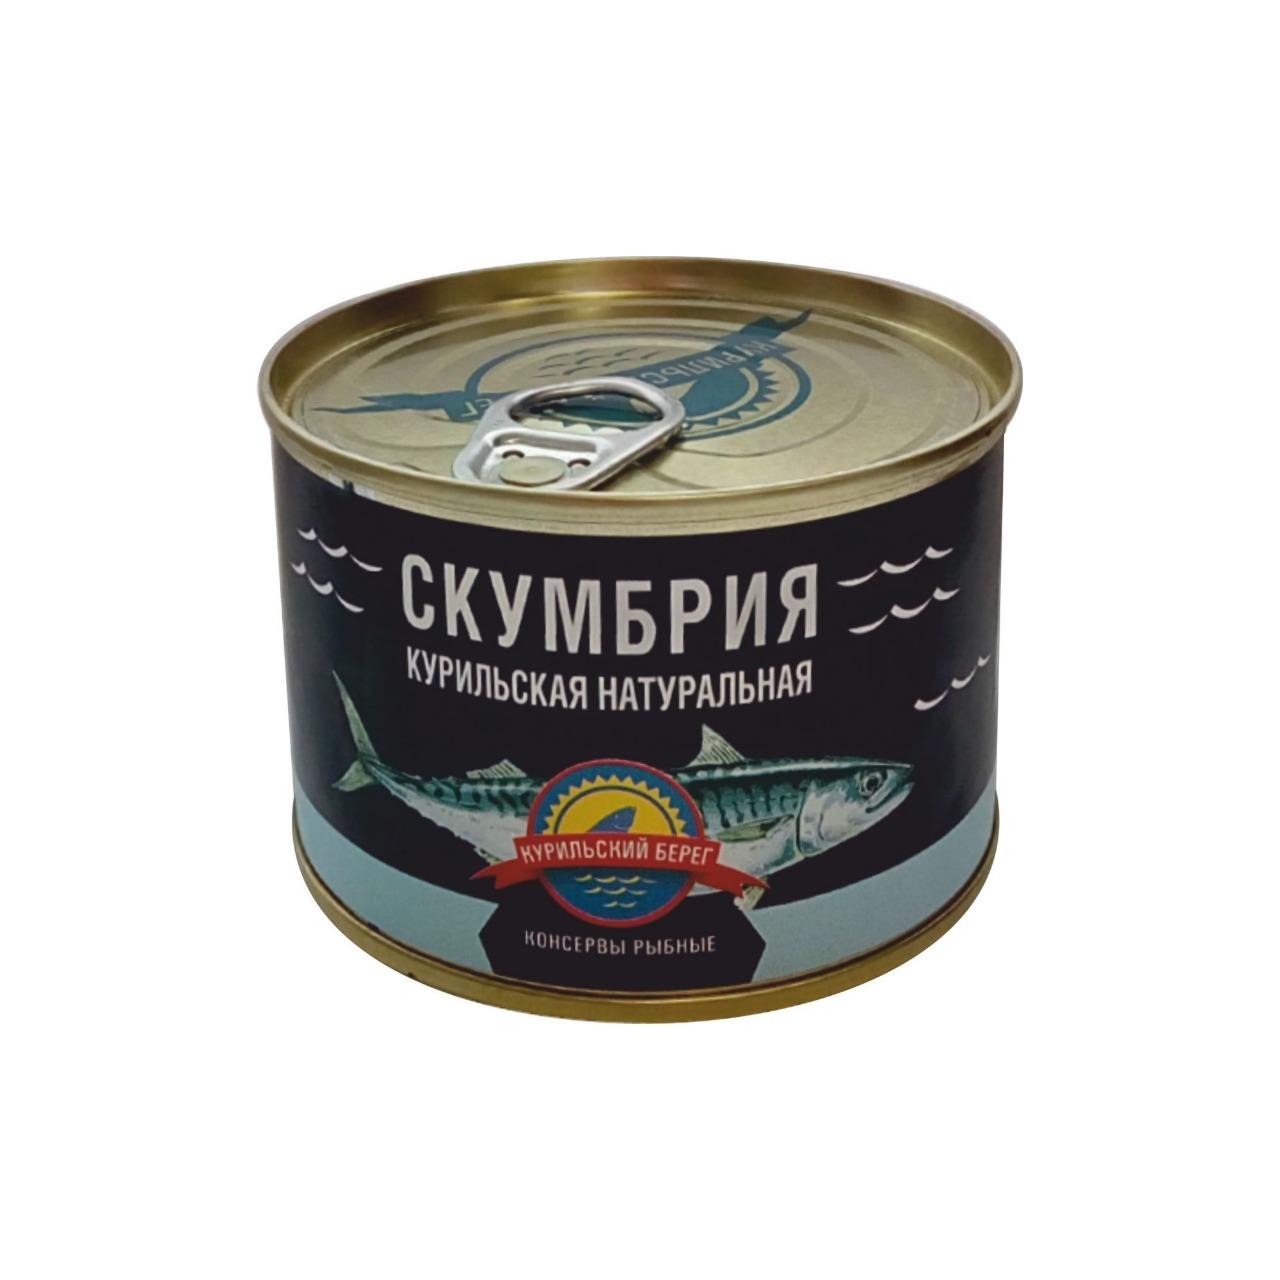 Скумбрия Курильский Берег натуральная 250 г эдуард андреевич дэлюж берег цвета нежности